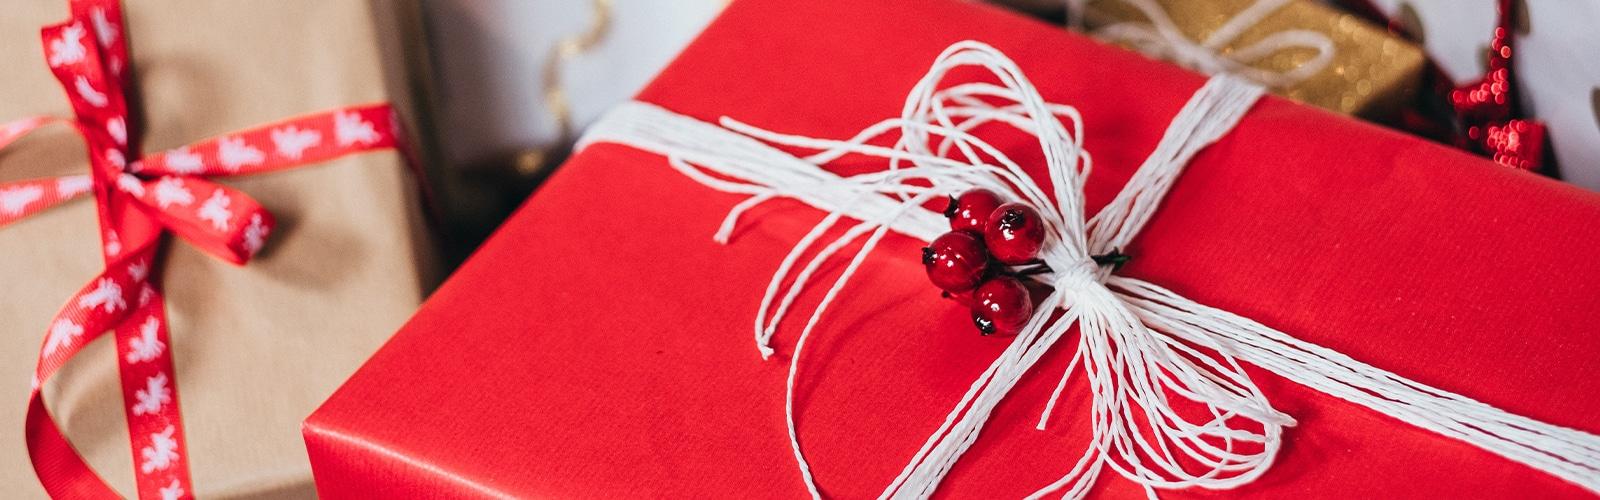 Noël : Les calendriers de l'avent à choper avant qu'il ne soit trop tard !